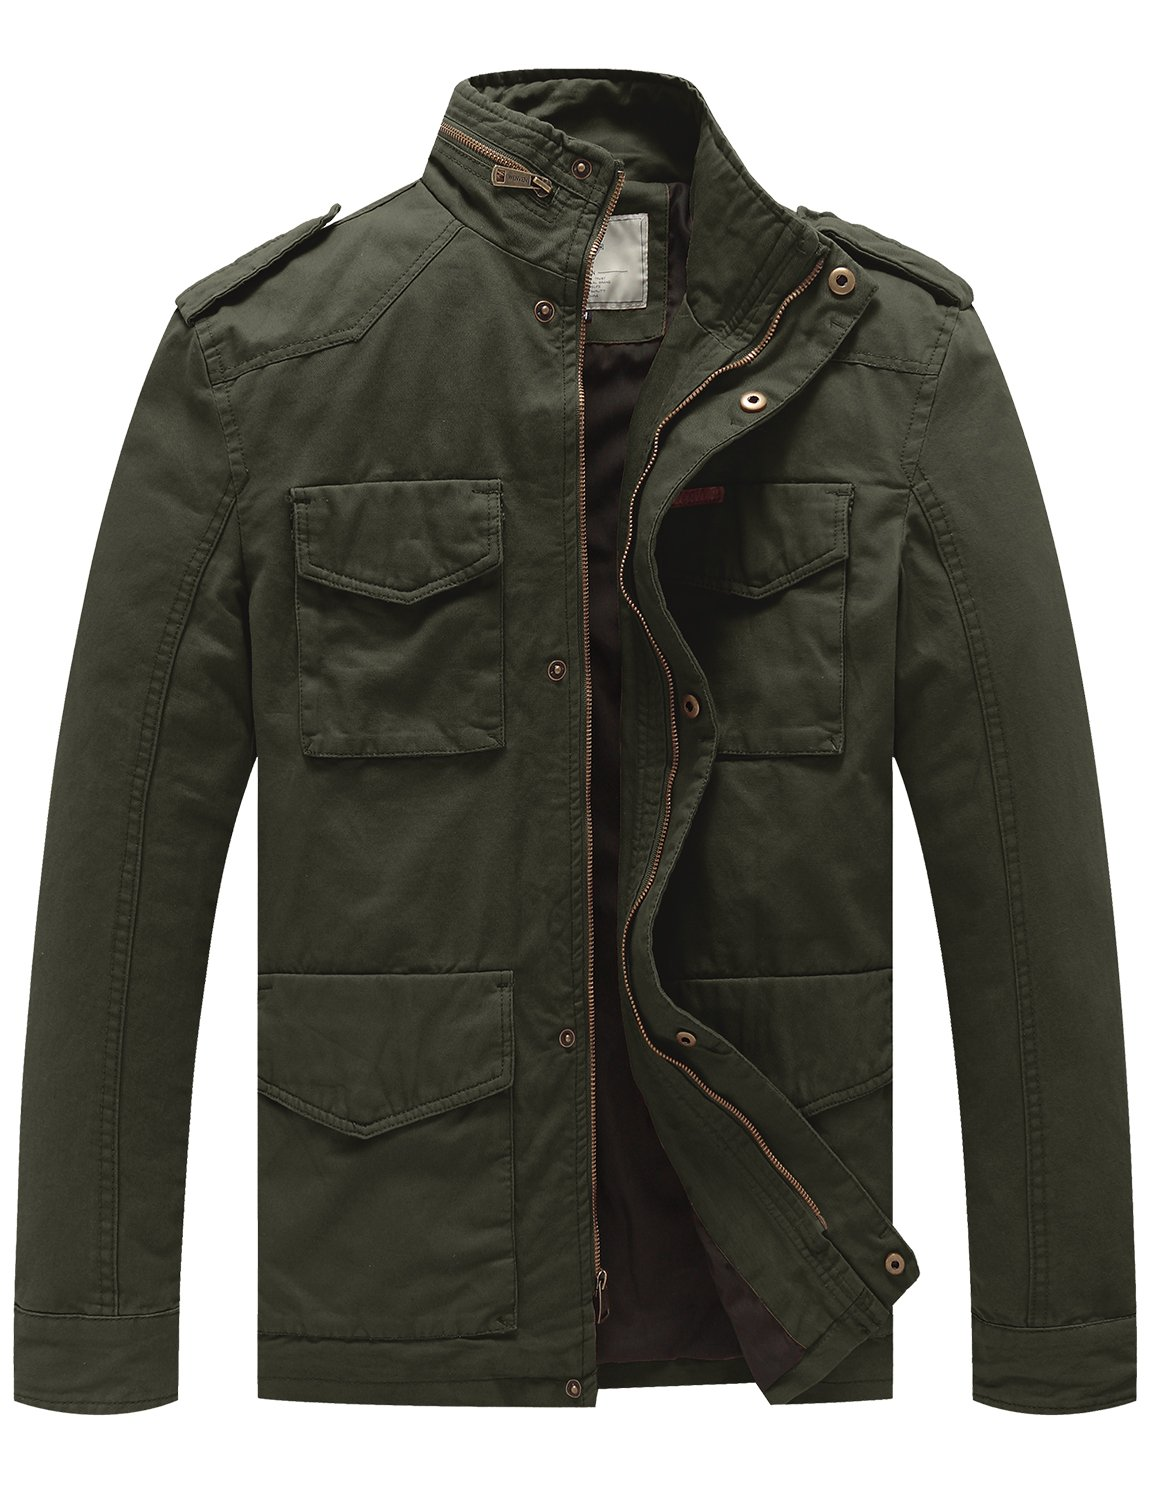 WenVen Men's Stand Collar Cotton Field Jacket (Army Green, M)